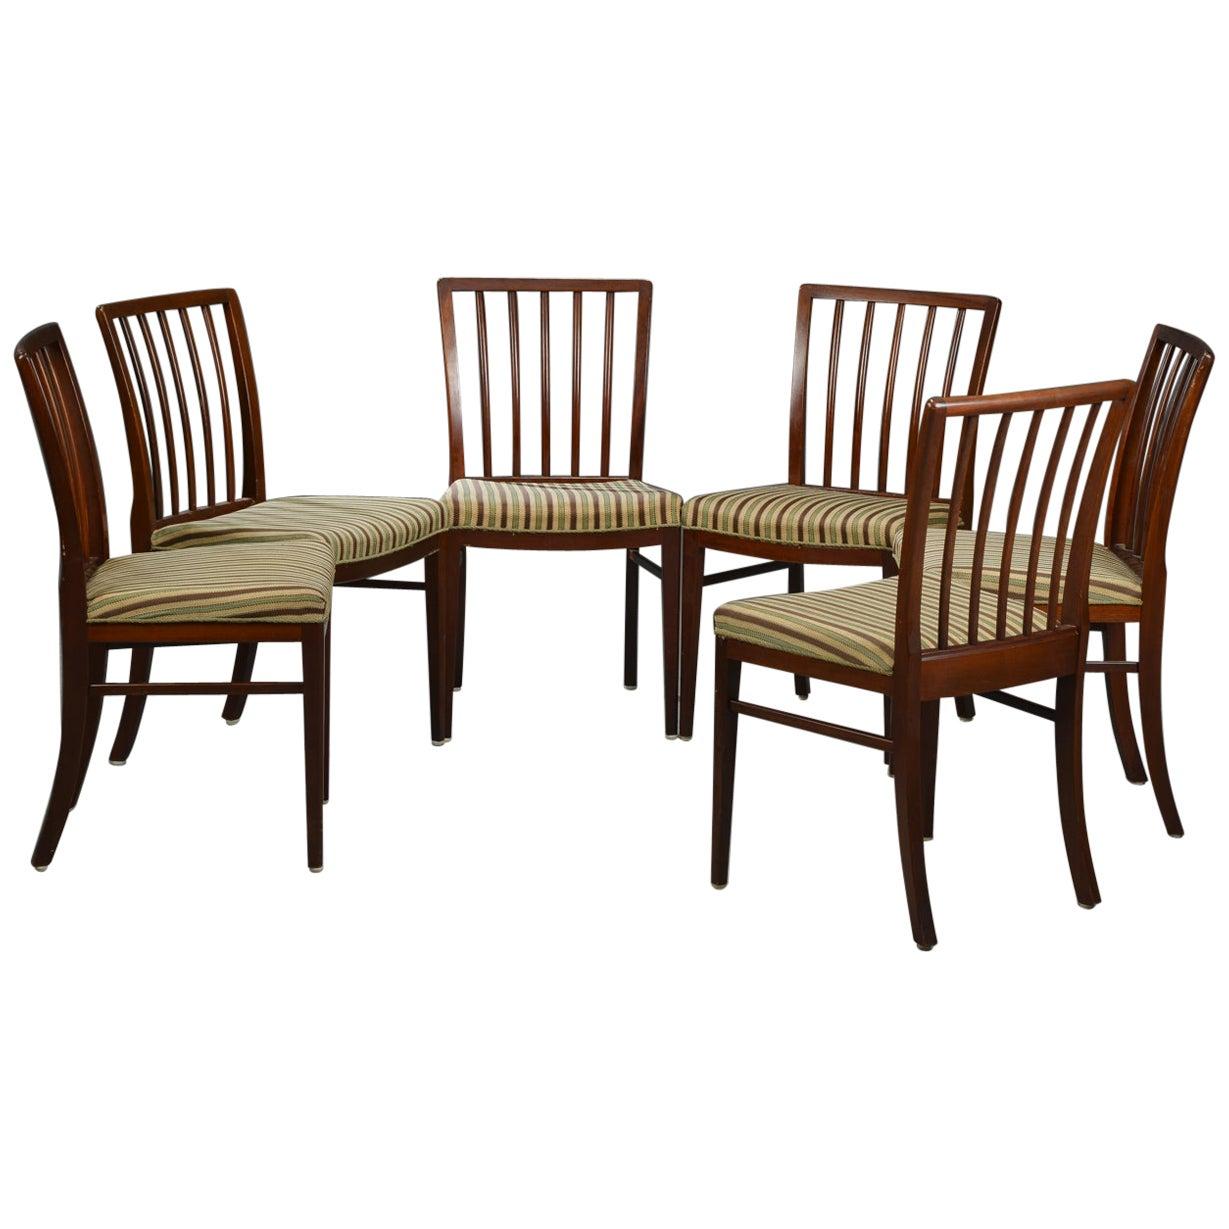 Six Danish Modern Dining Chairs